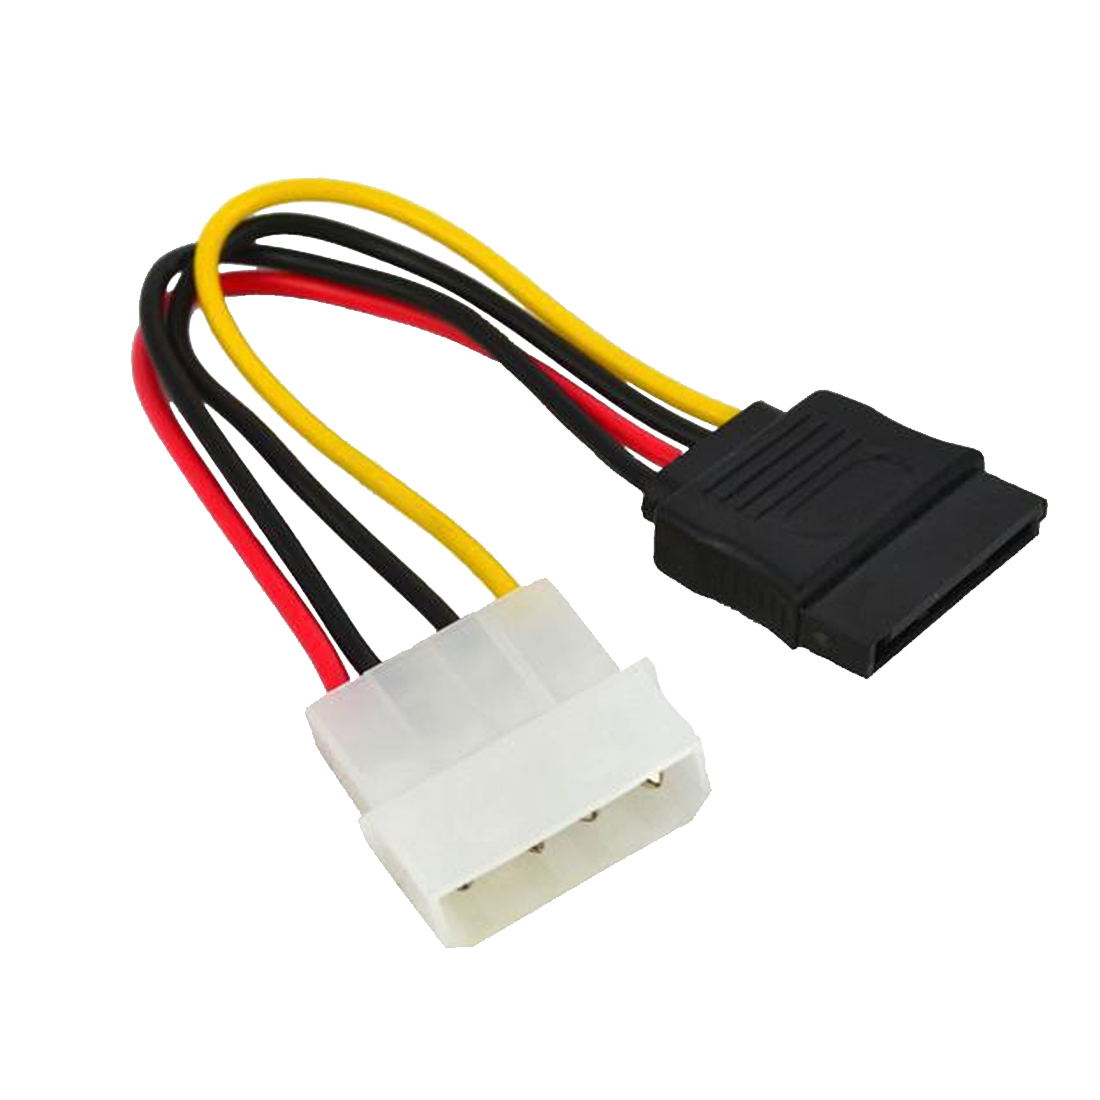 Image 5 - Marsnaska отличный 1 шт. Serial ATA SATA 4 Pin IDE до 15 Pin HDD адаптер питания кабель жесткого диска адаптер штекер женский кабель